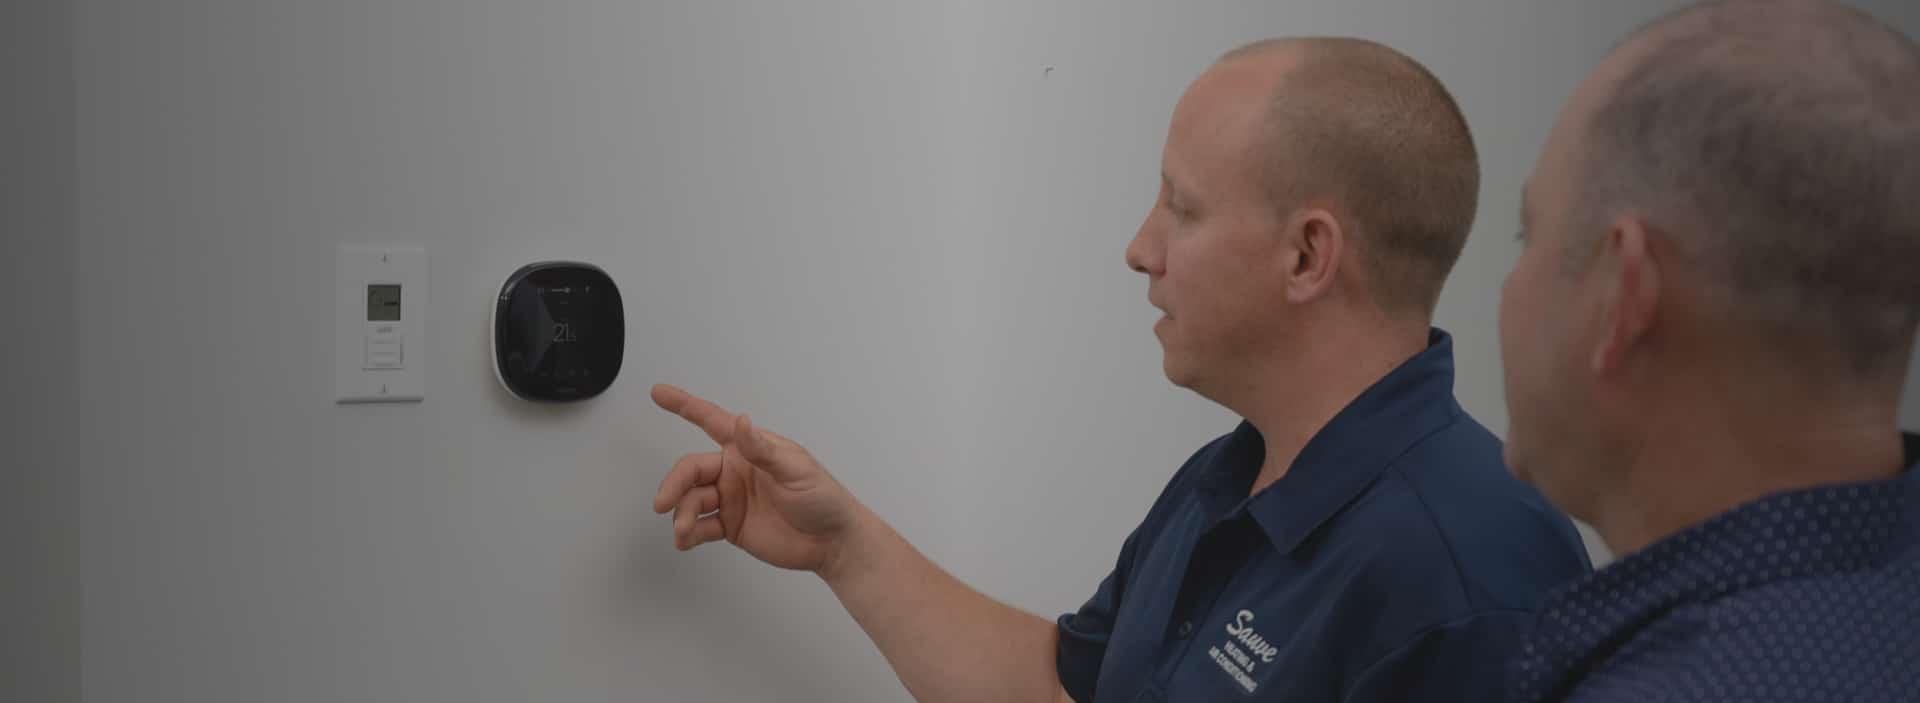 Ben Sauve adjusting the heat in an Ottawa home